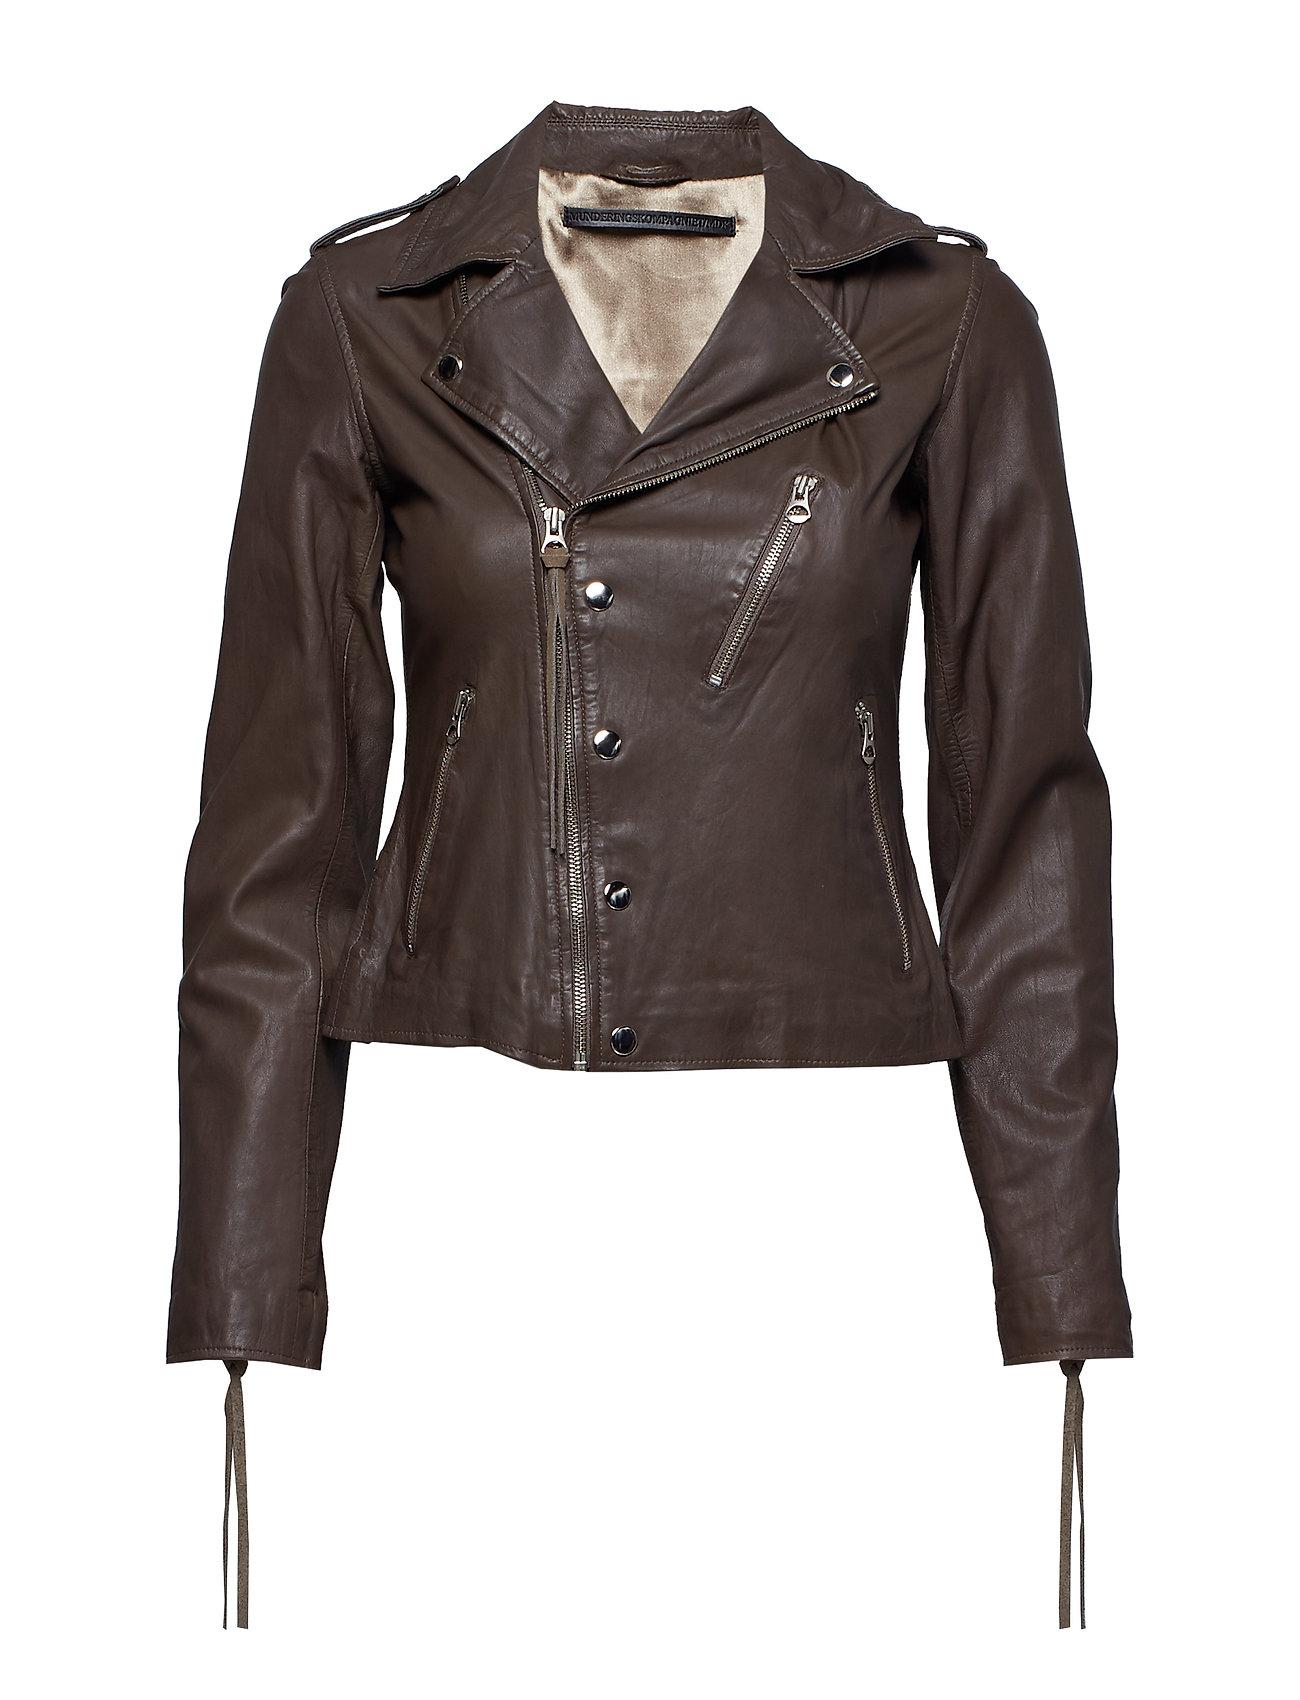 MDK / Munderingskompagniet Adana jacket